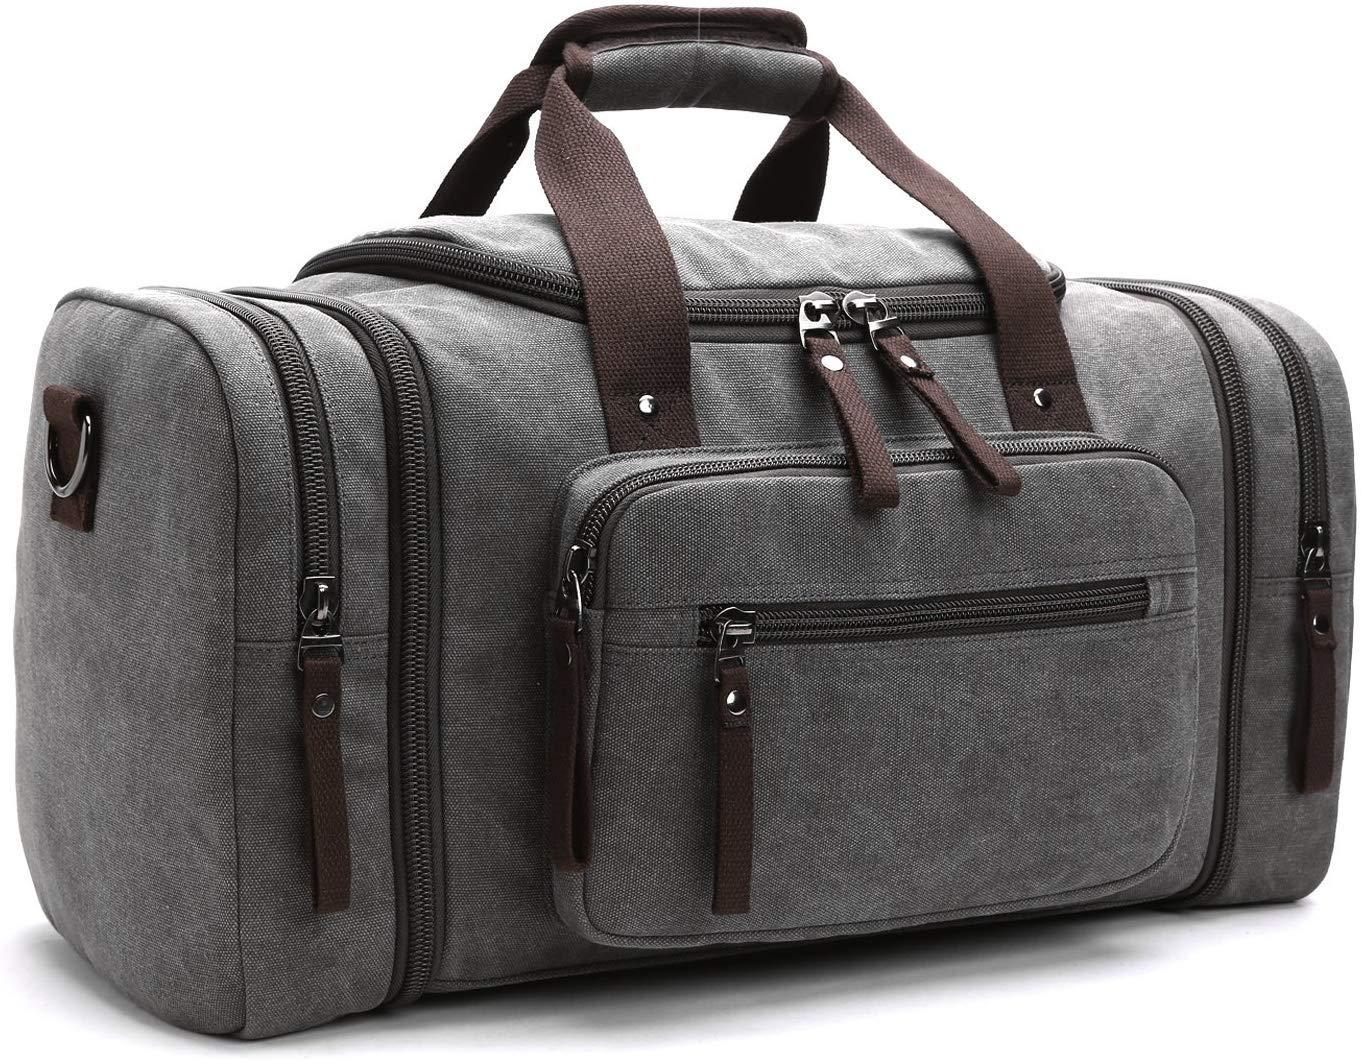 bolsas cómodas para viajar